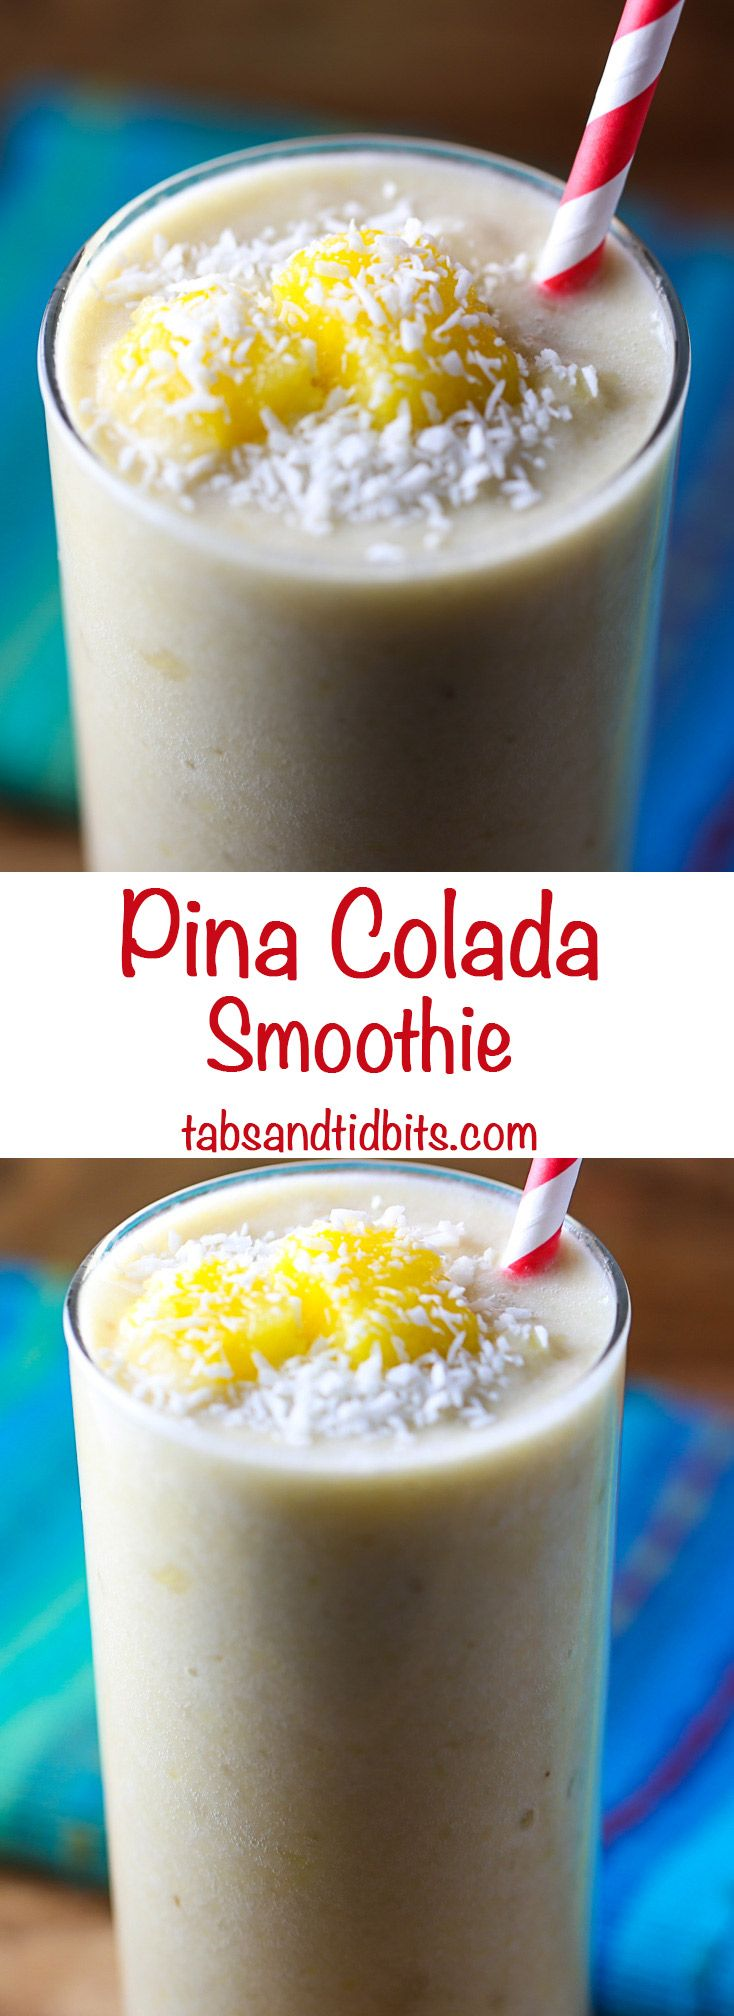 Pina Colada Smoothie Recipe Healthy fruit smoothies